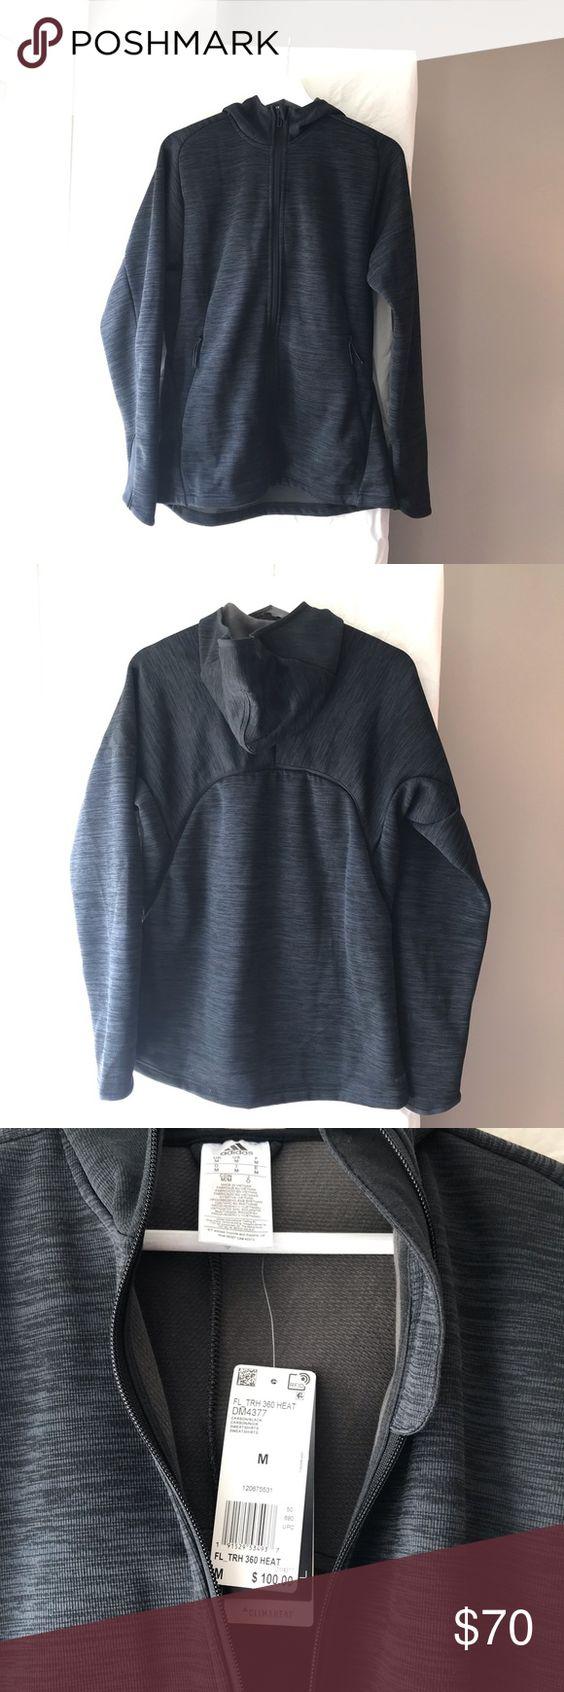 Predownload: Adidas Climaheat 360 Black Gray Zip Hoodie Size M Grey Zip Hoodie Zip Hoodie Hoodies [ 1692 x 564 Pixel ]